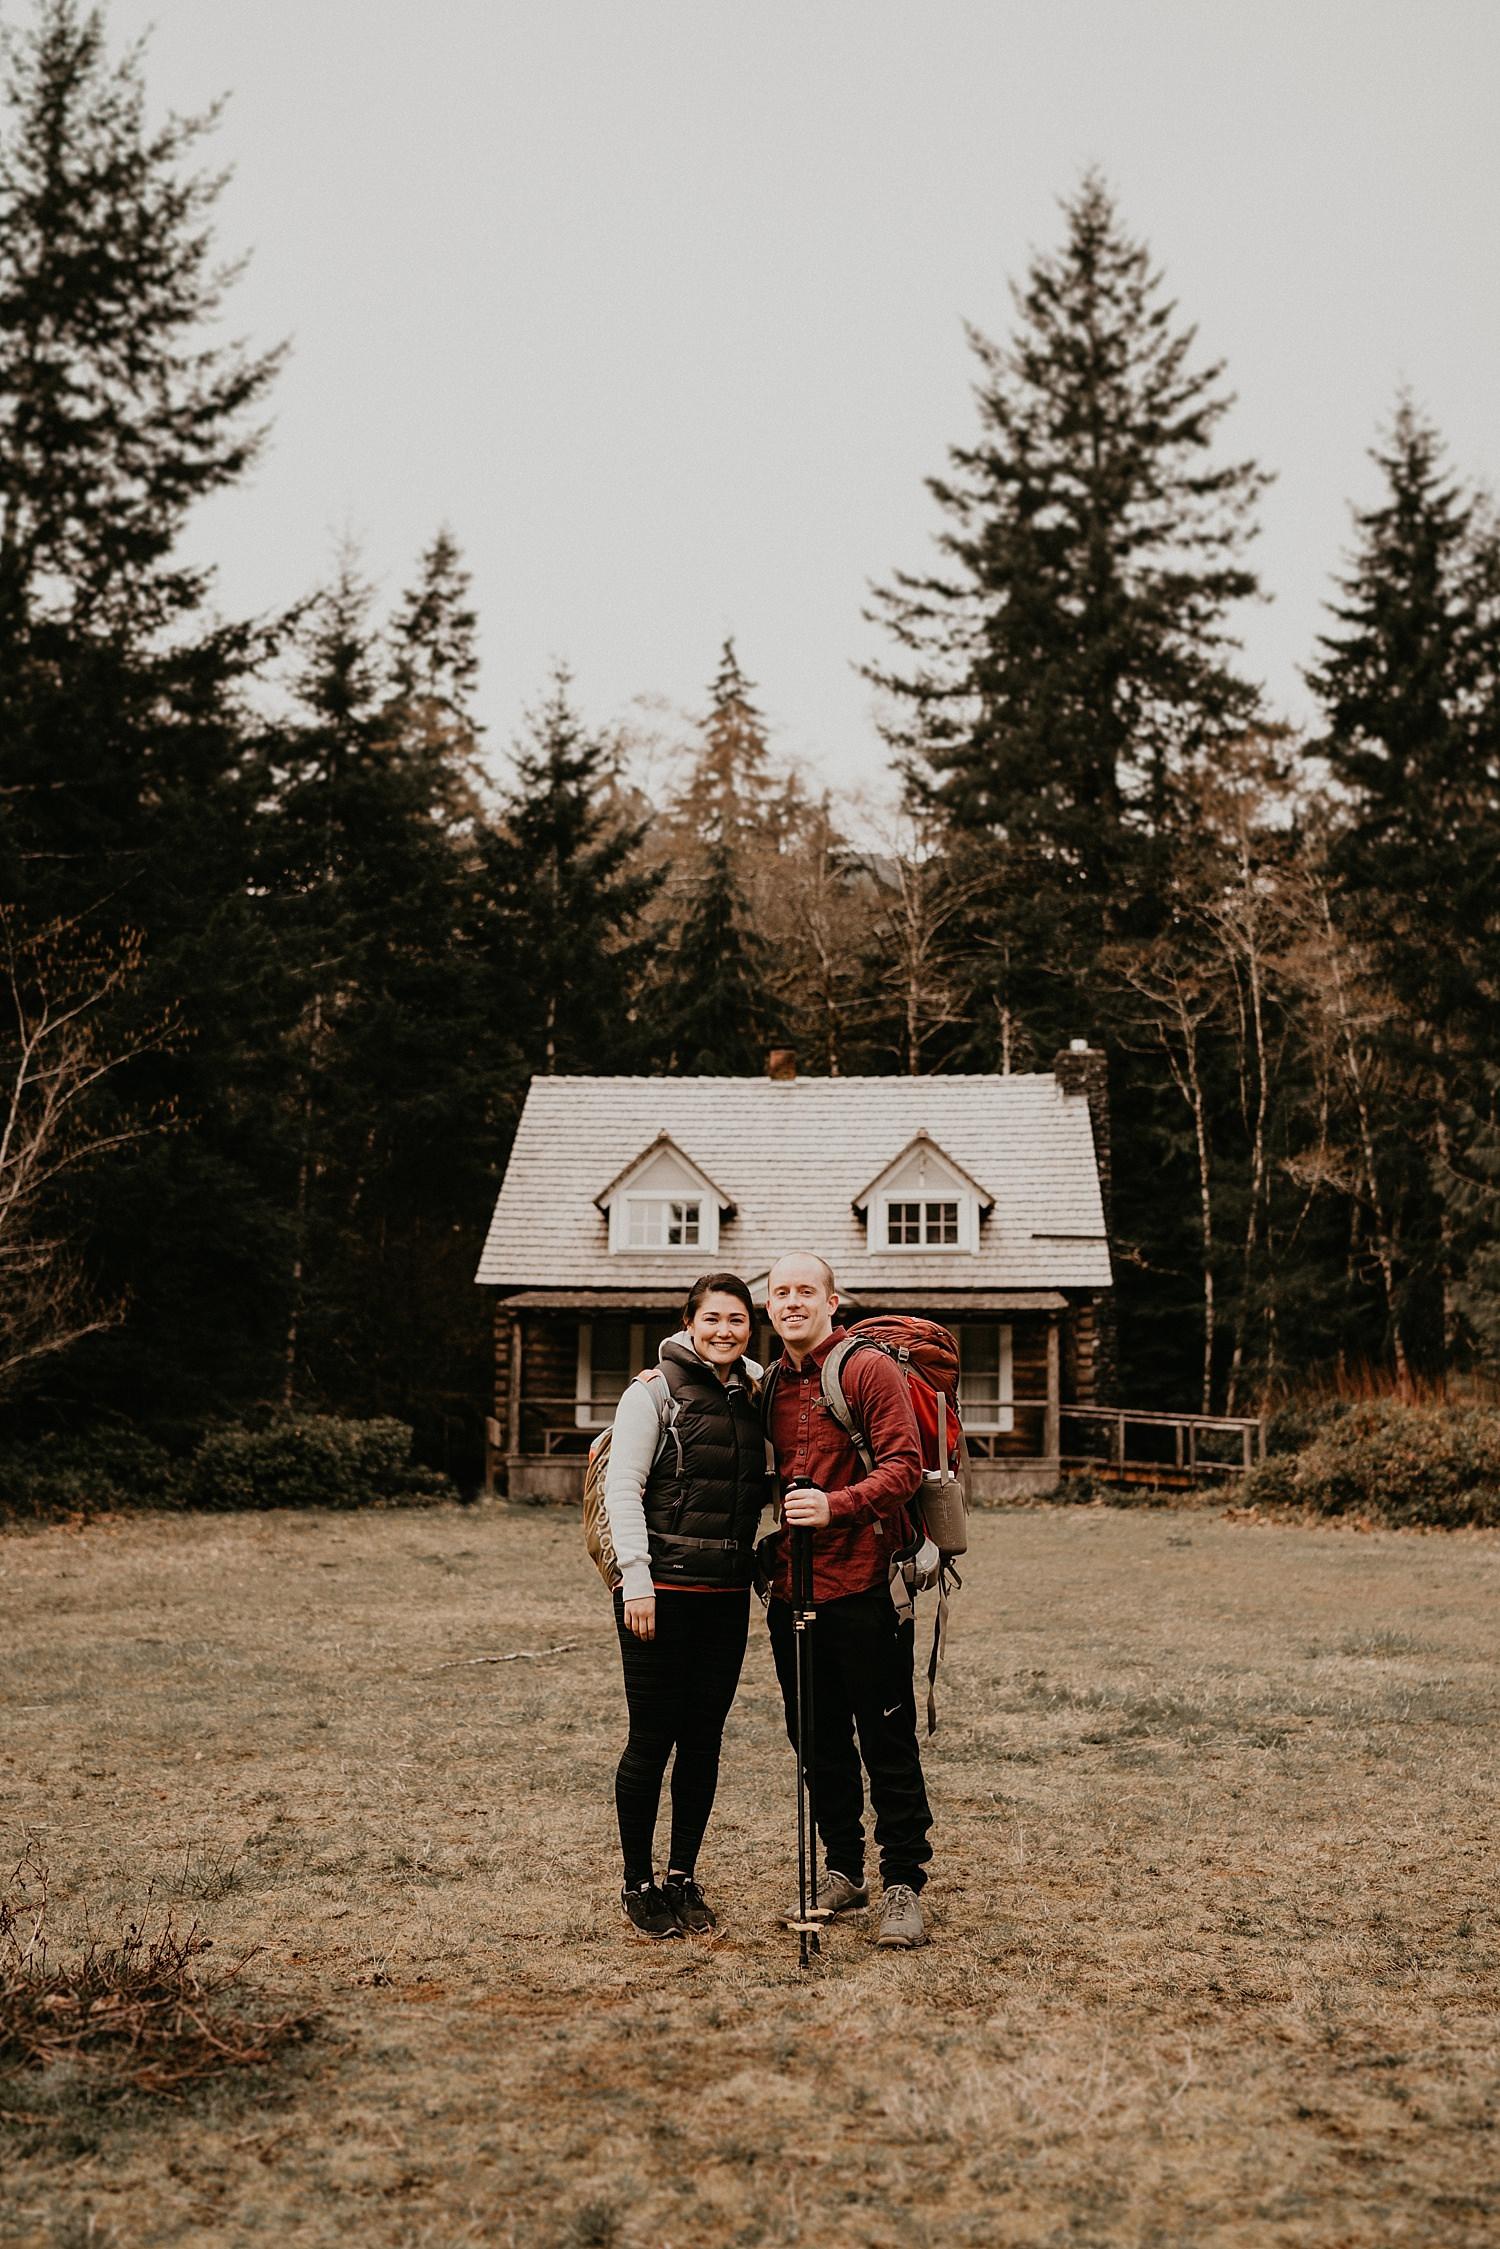 Mount storm king ranger station cute adventure engagement session Seattle PNW Wedding Photographer